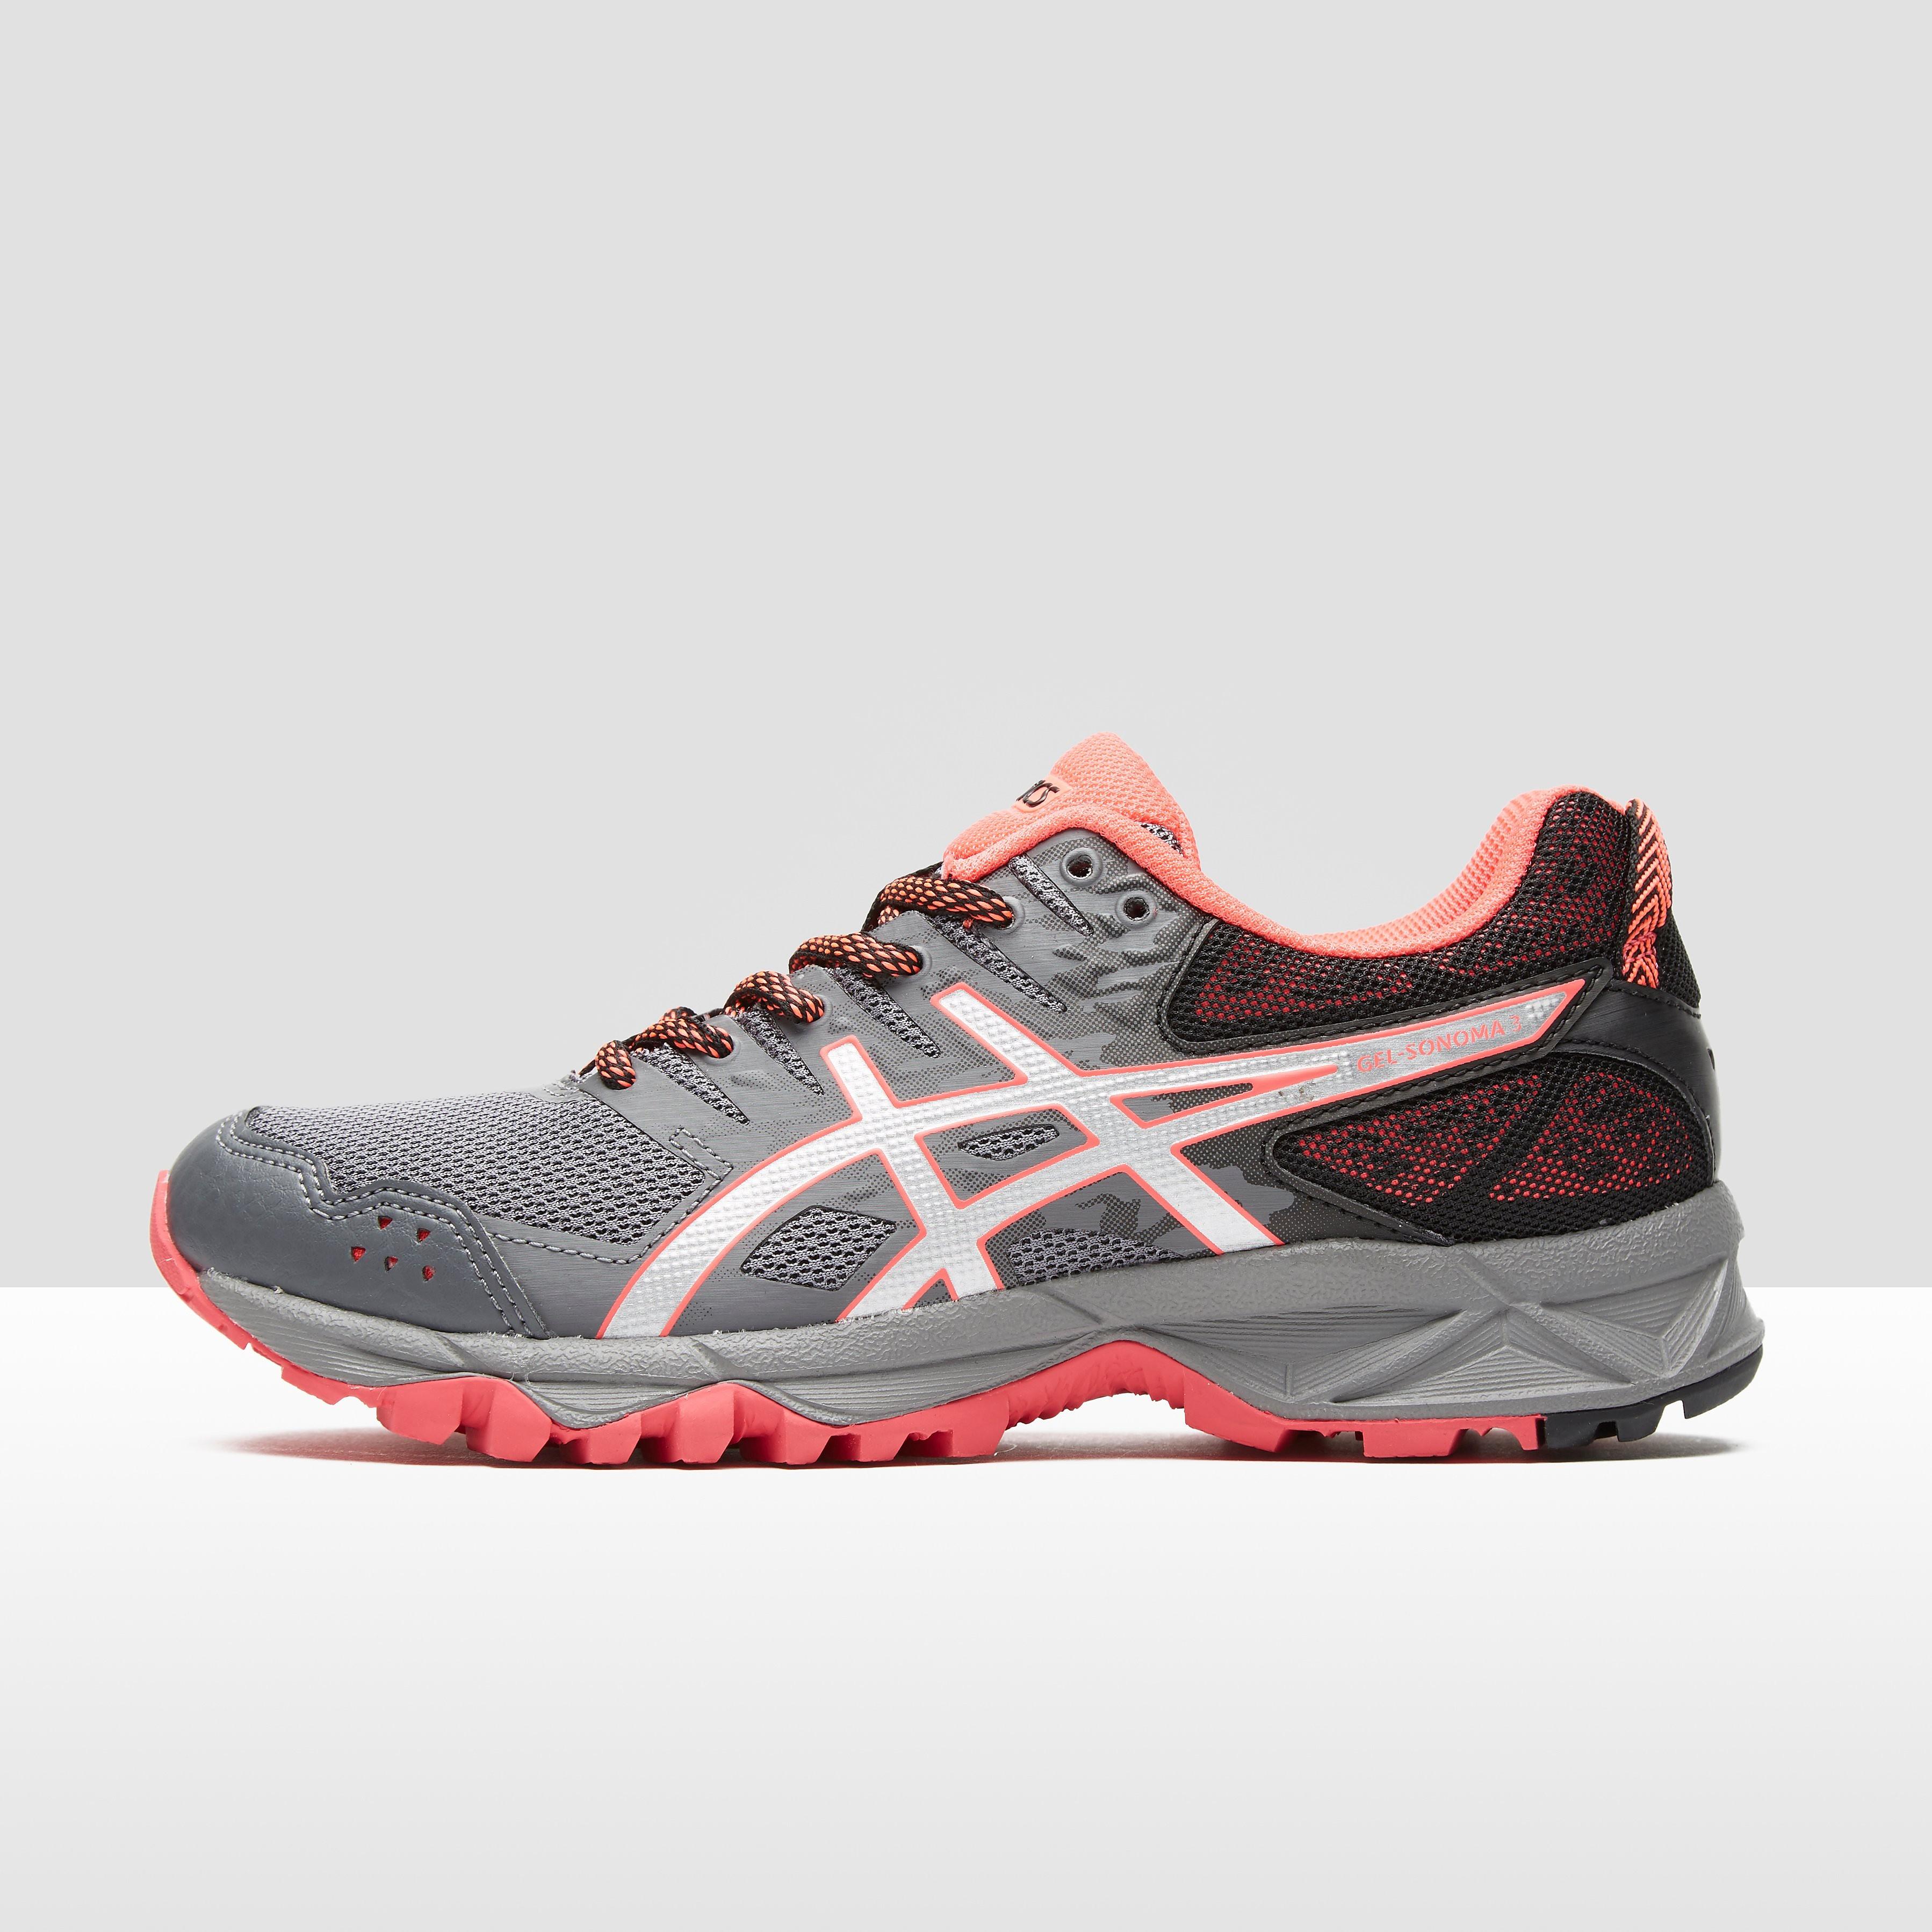 ASICS GEL- Sonoma 3 Women's Trail Running Shoes